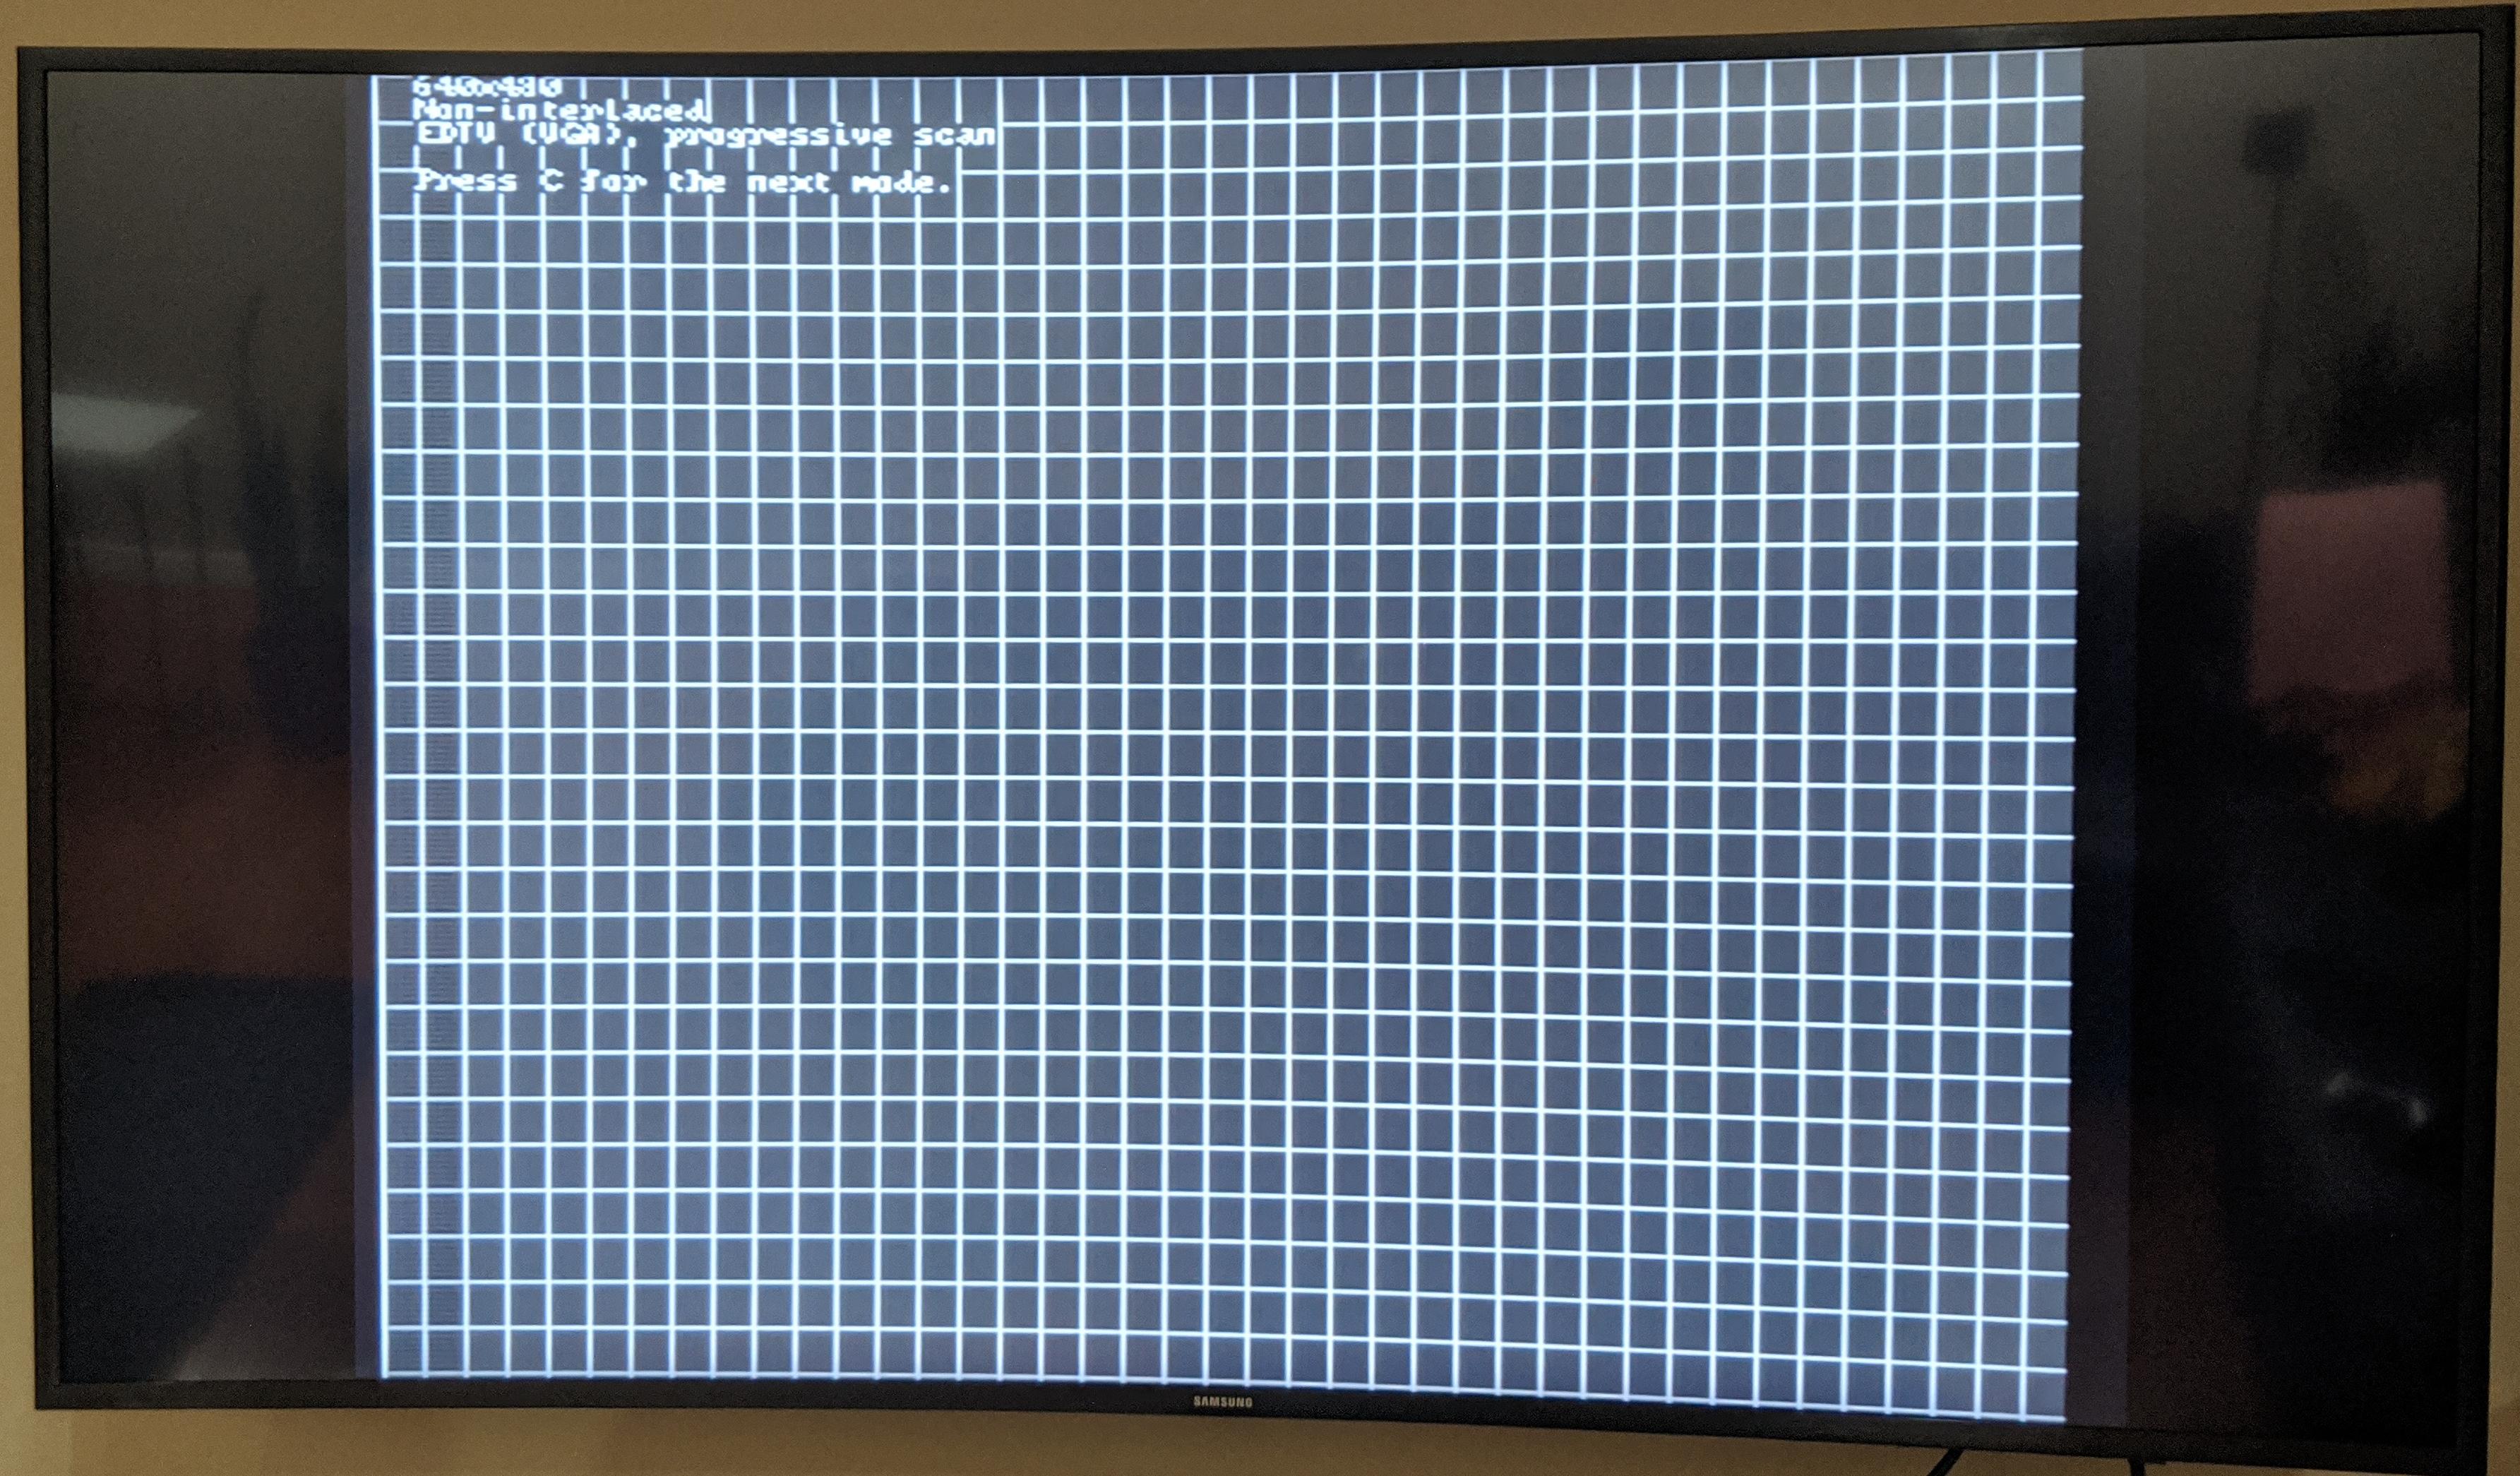 EDTV 640x480.jpg